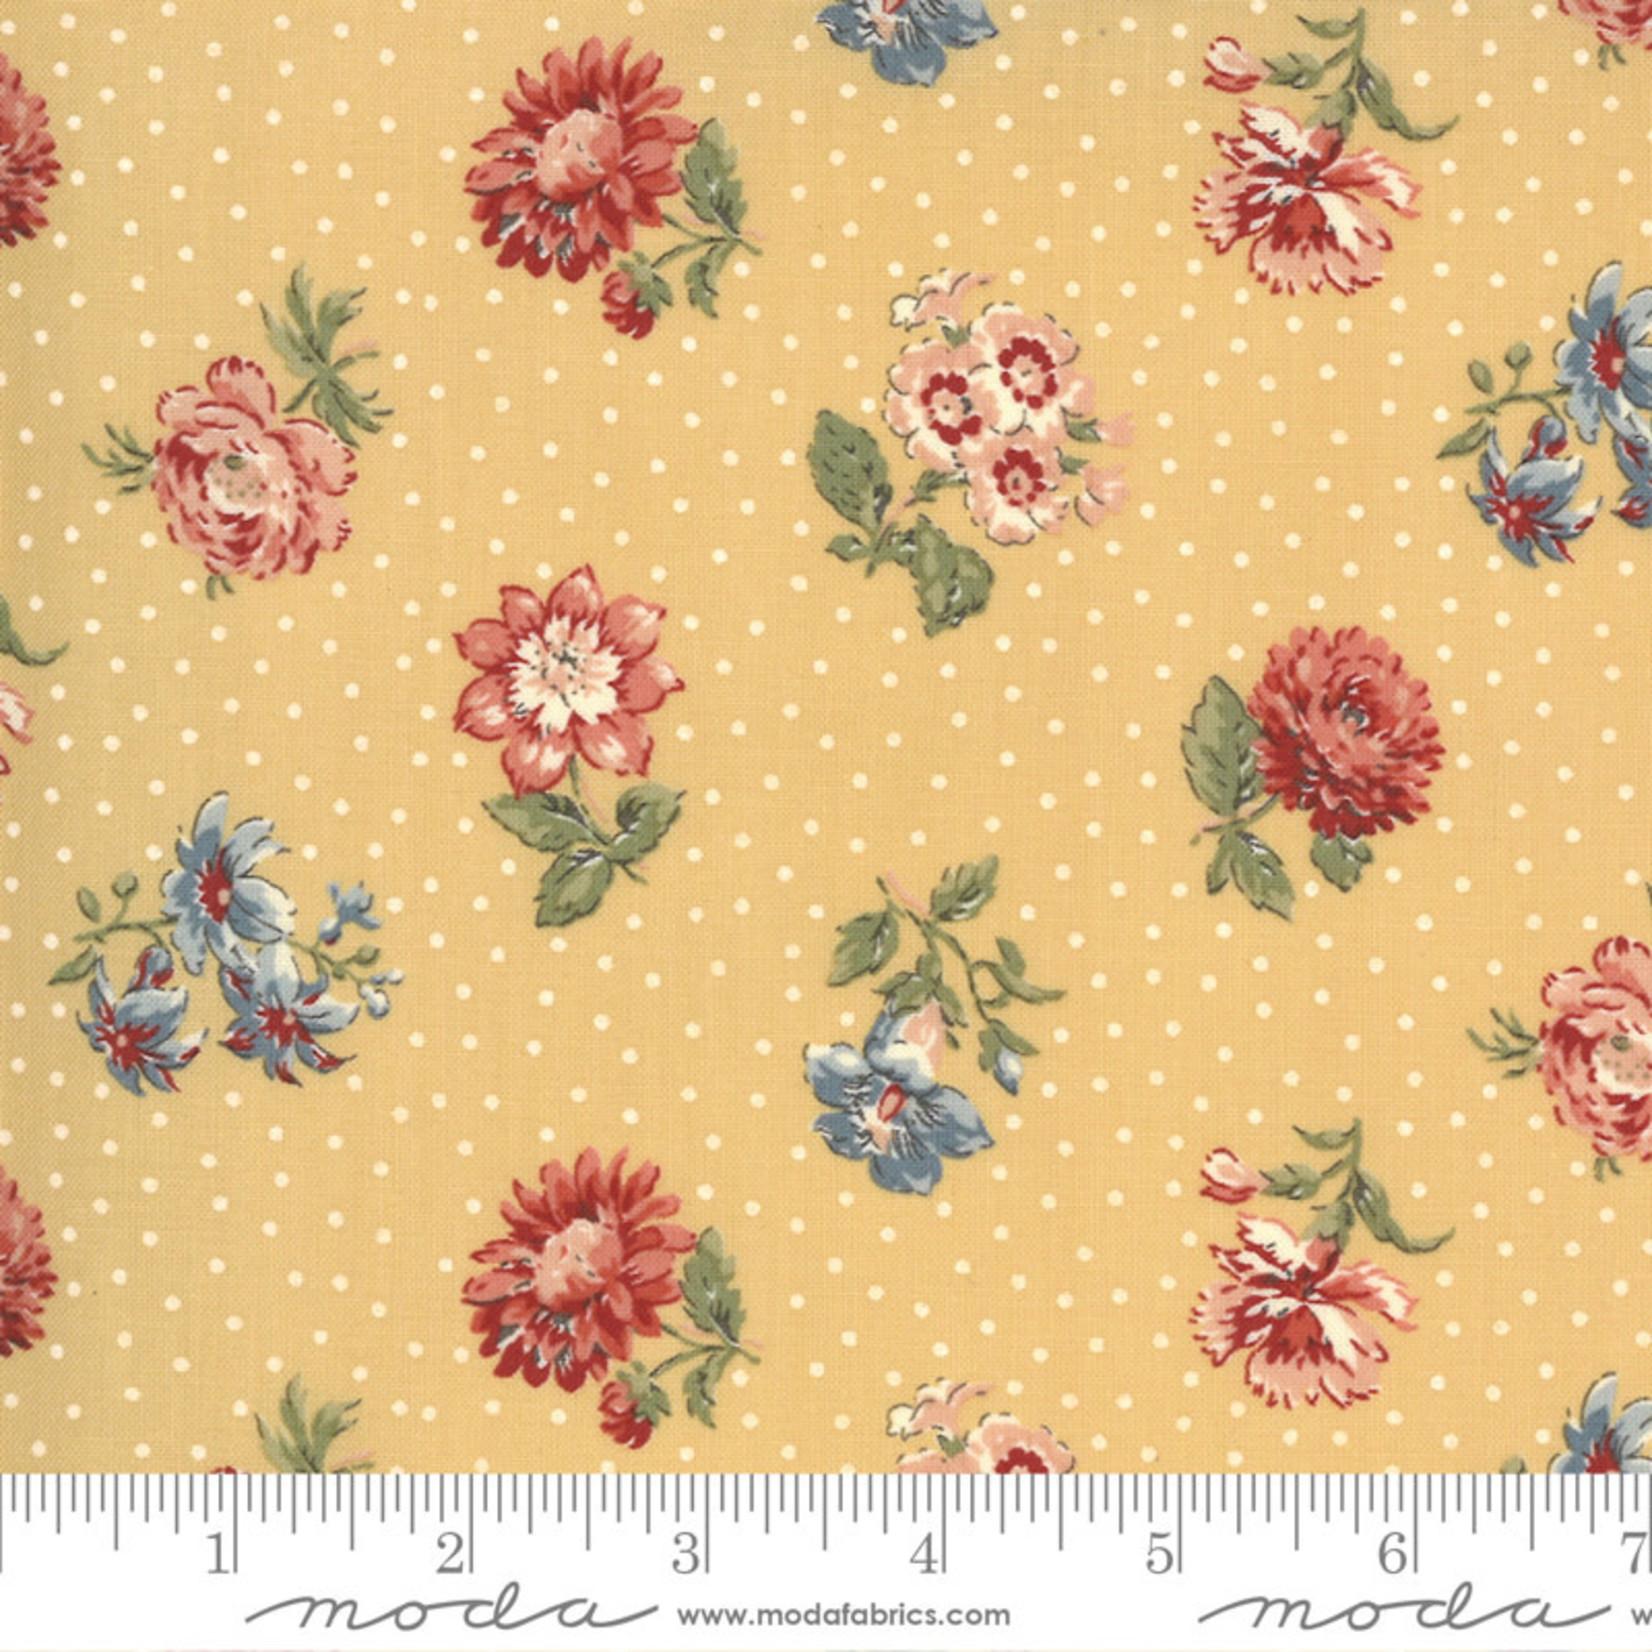 FRENCH GENERAL Jardins De Fleurs, Rayol, Saffron 13893-15 $0.20 per cm or $20/m